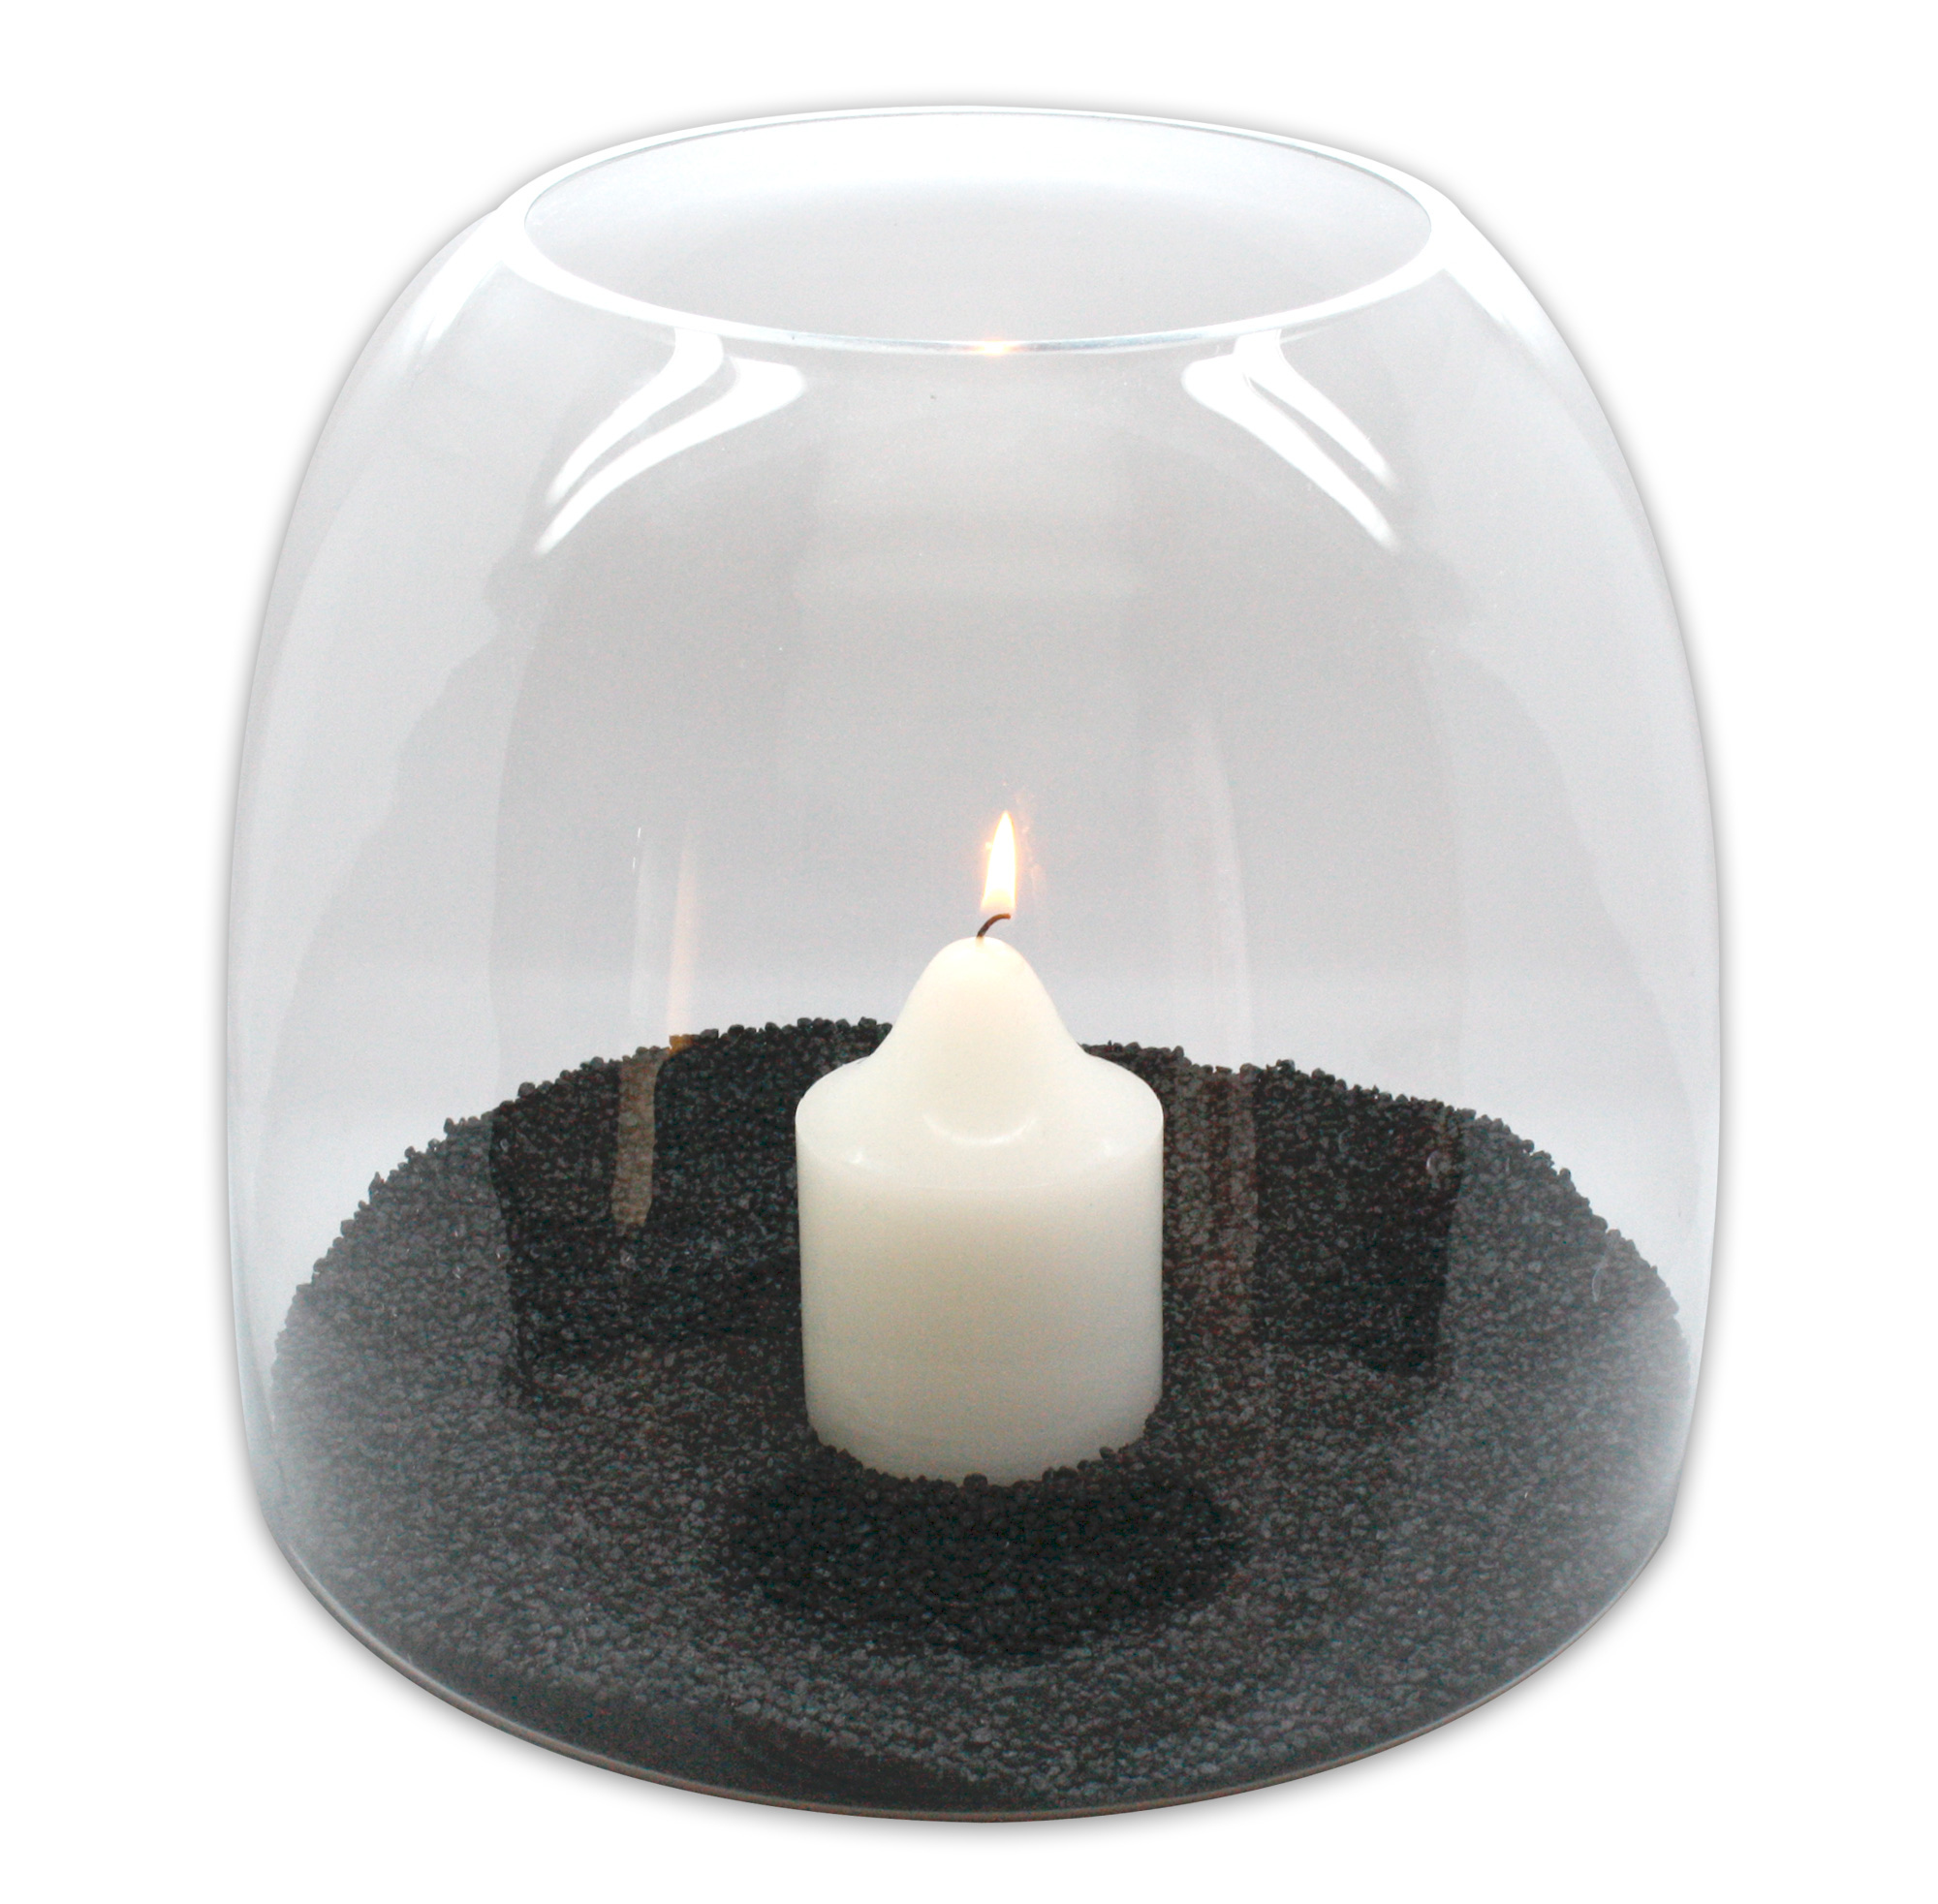 xl windlicht teelicht kerzenglas gartenlaterne laterne. Black Bedroom Furniture Sets. Home Design Ideas